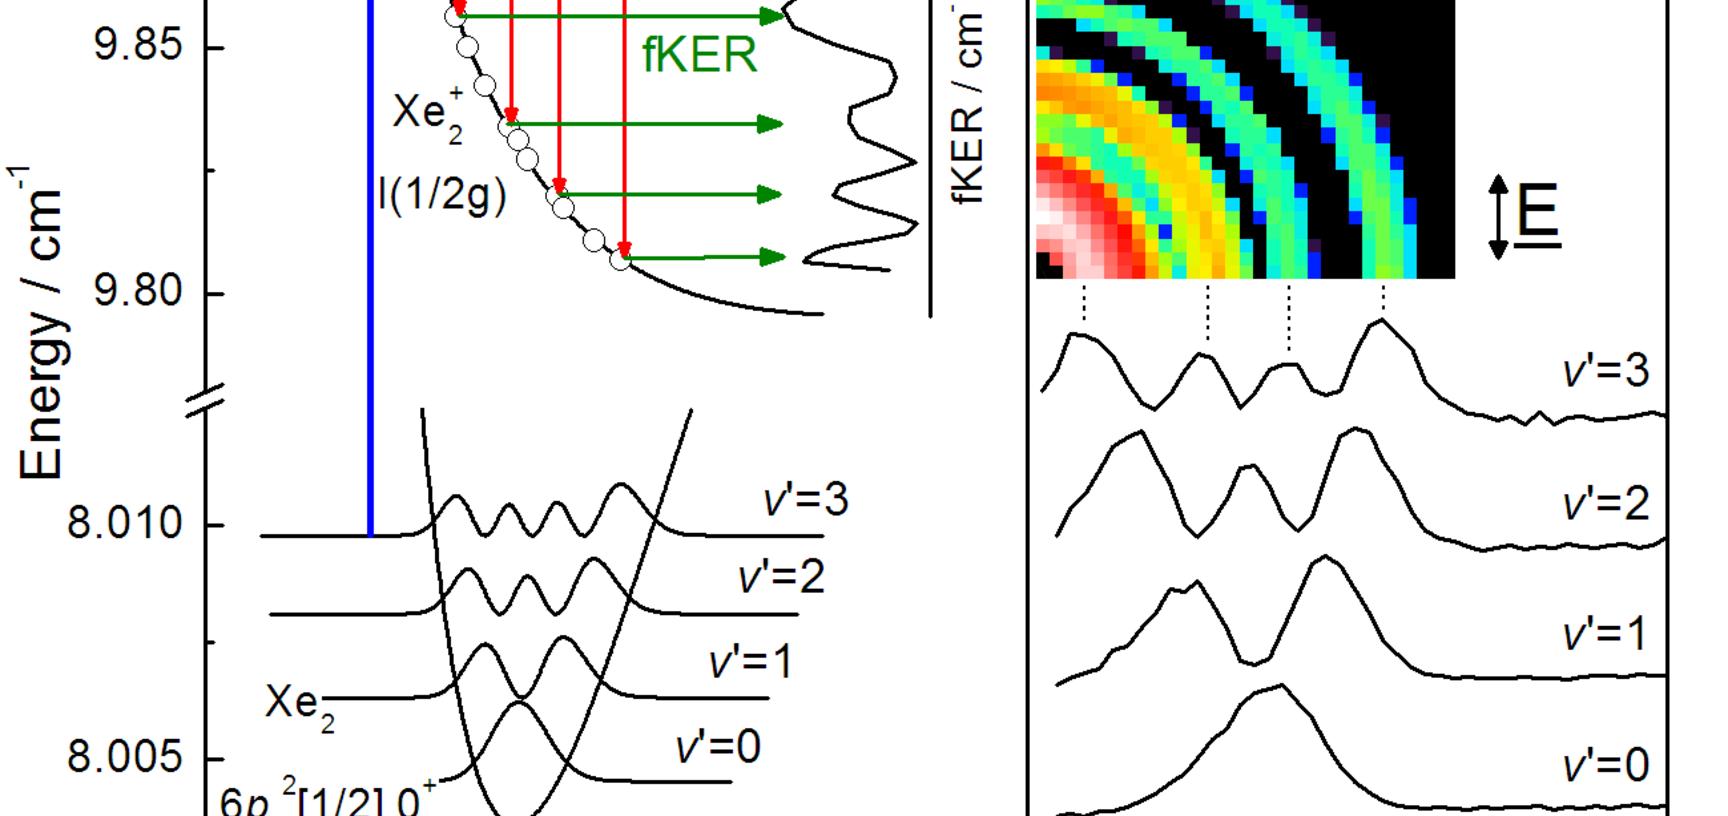 xe2 wavefunction imaging